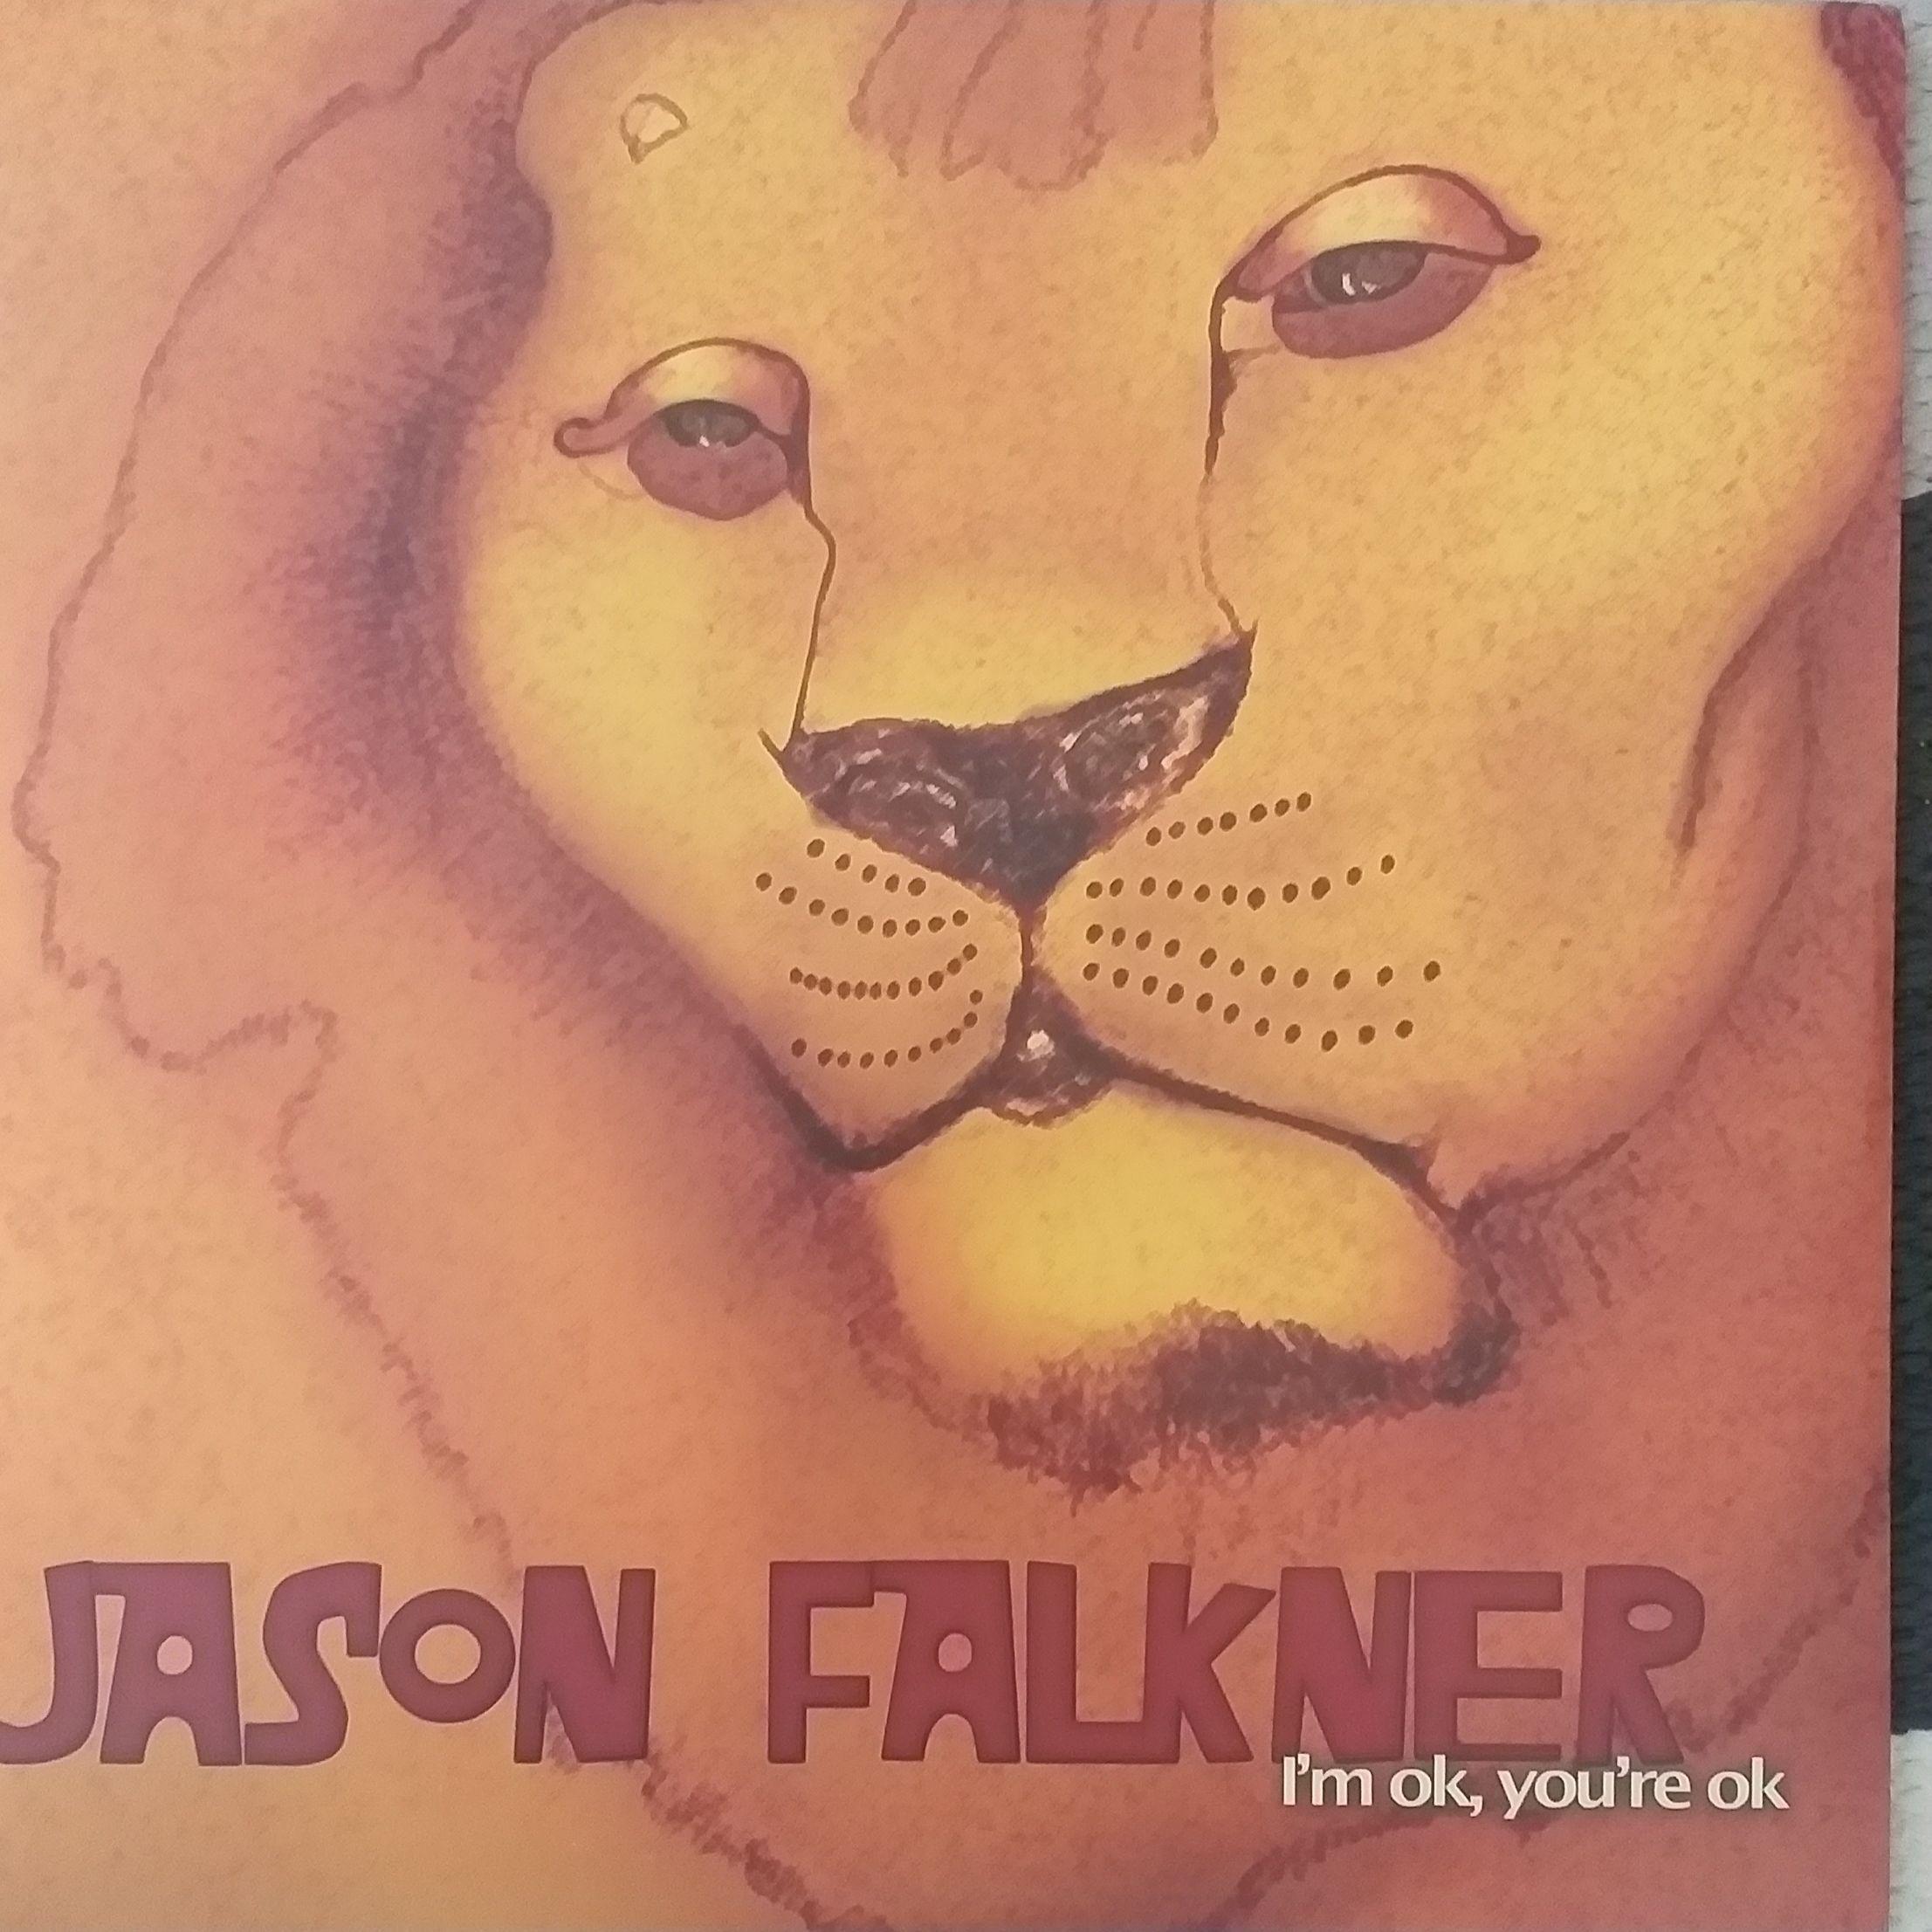 Jason Falkner I'm ok, you're ok LP undefined